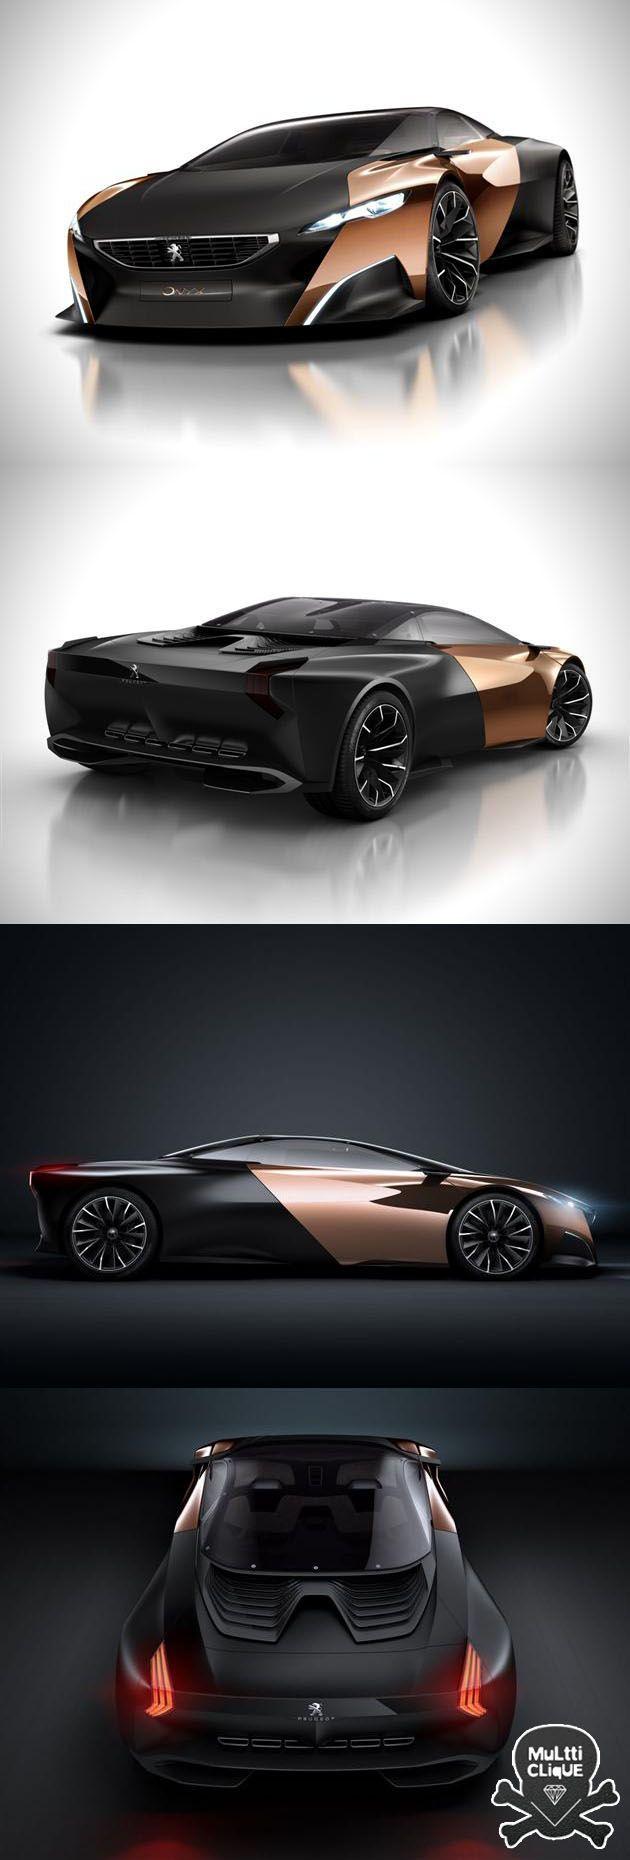 Best 25 Concept Cars Ideas On Pinterest Future Car Cool Cars